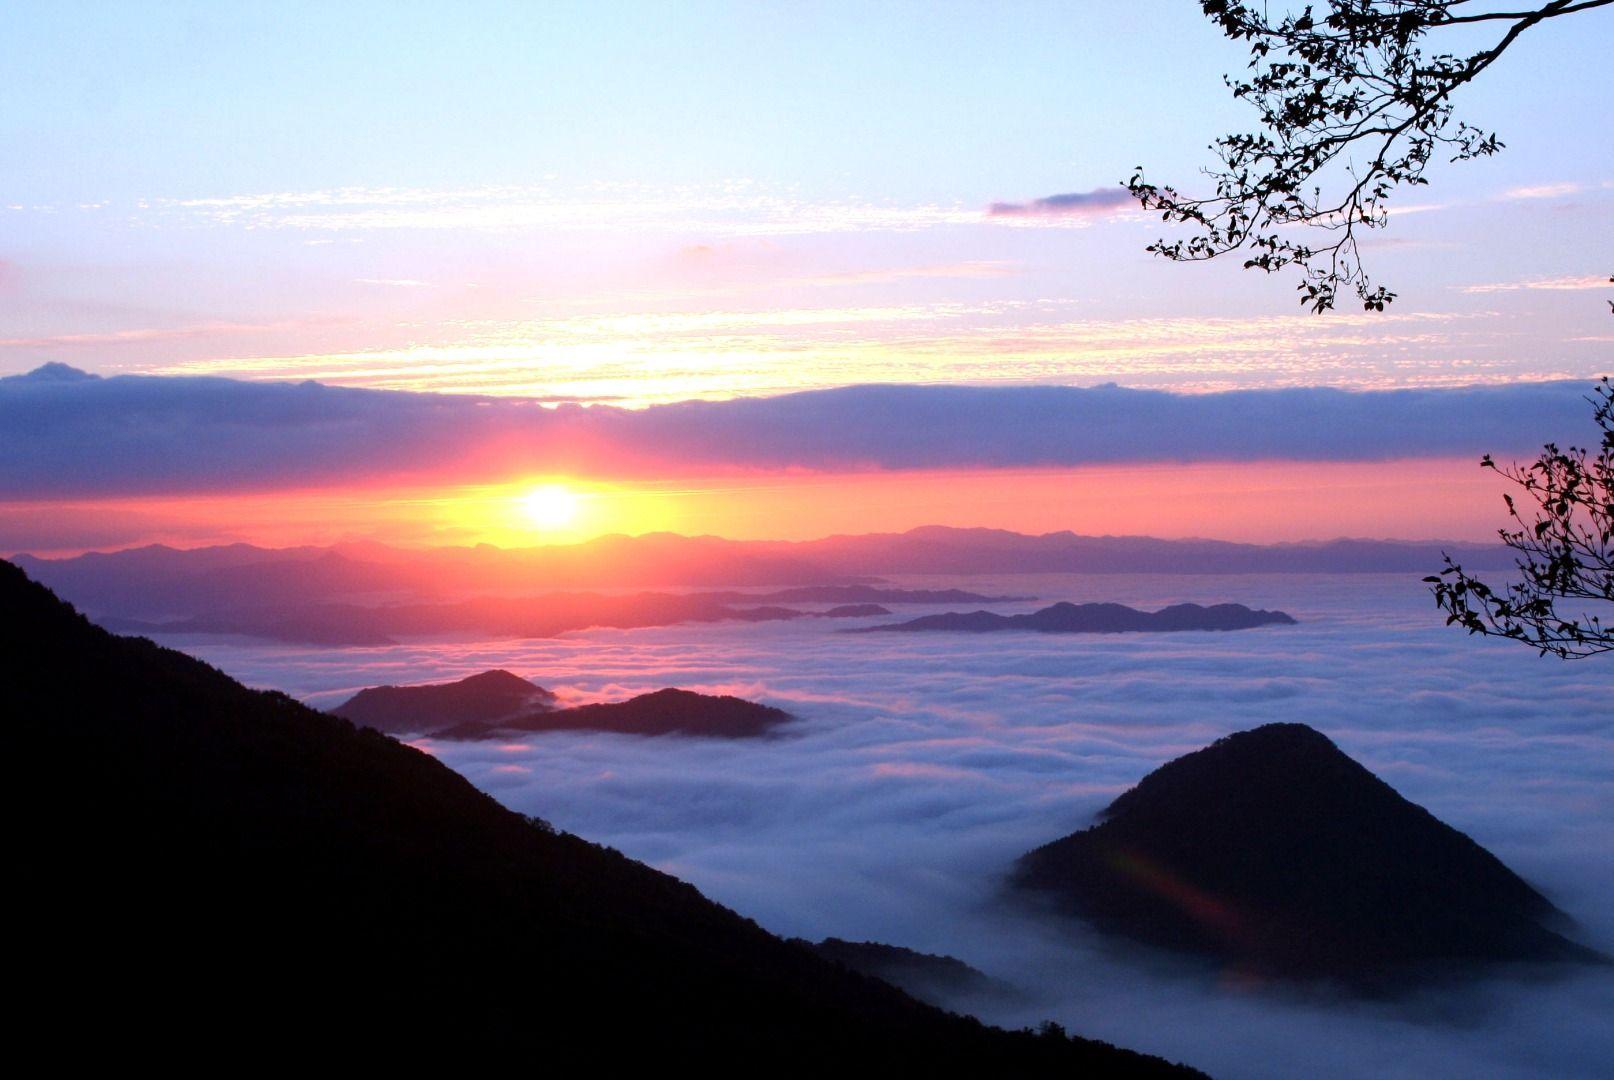 Oeyama or Mount Oe (Kyoto Prefecture)